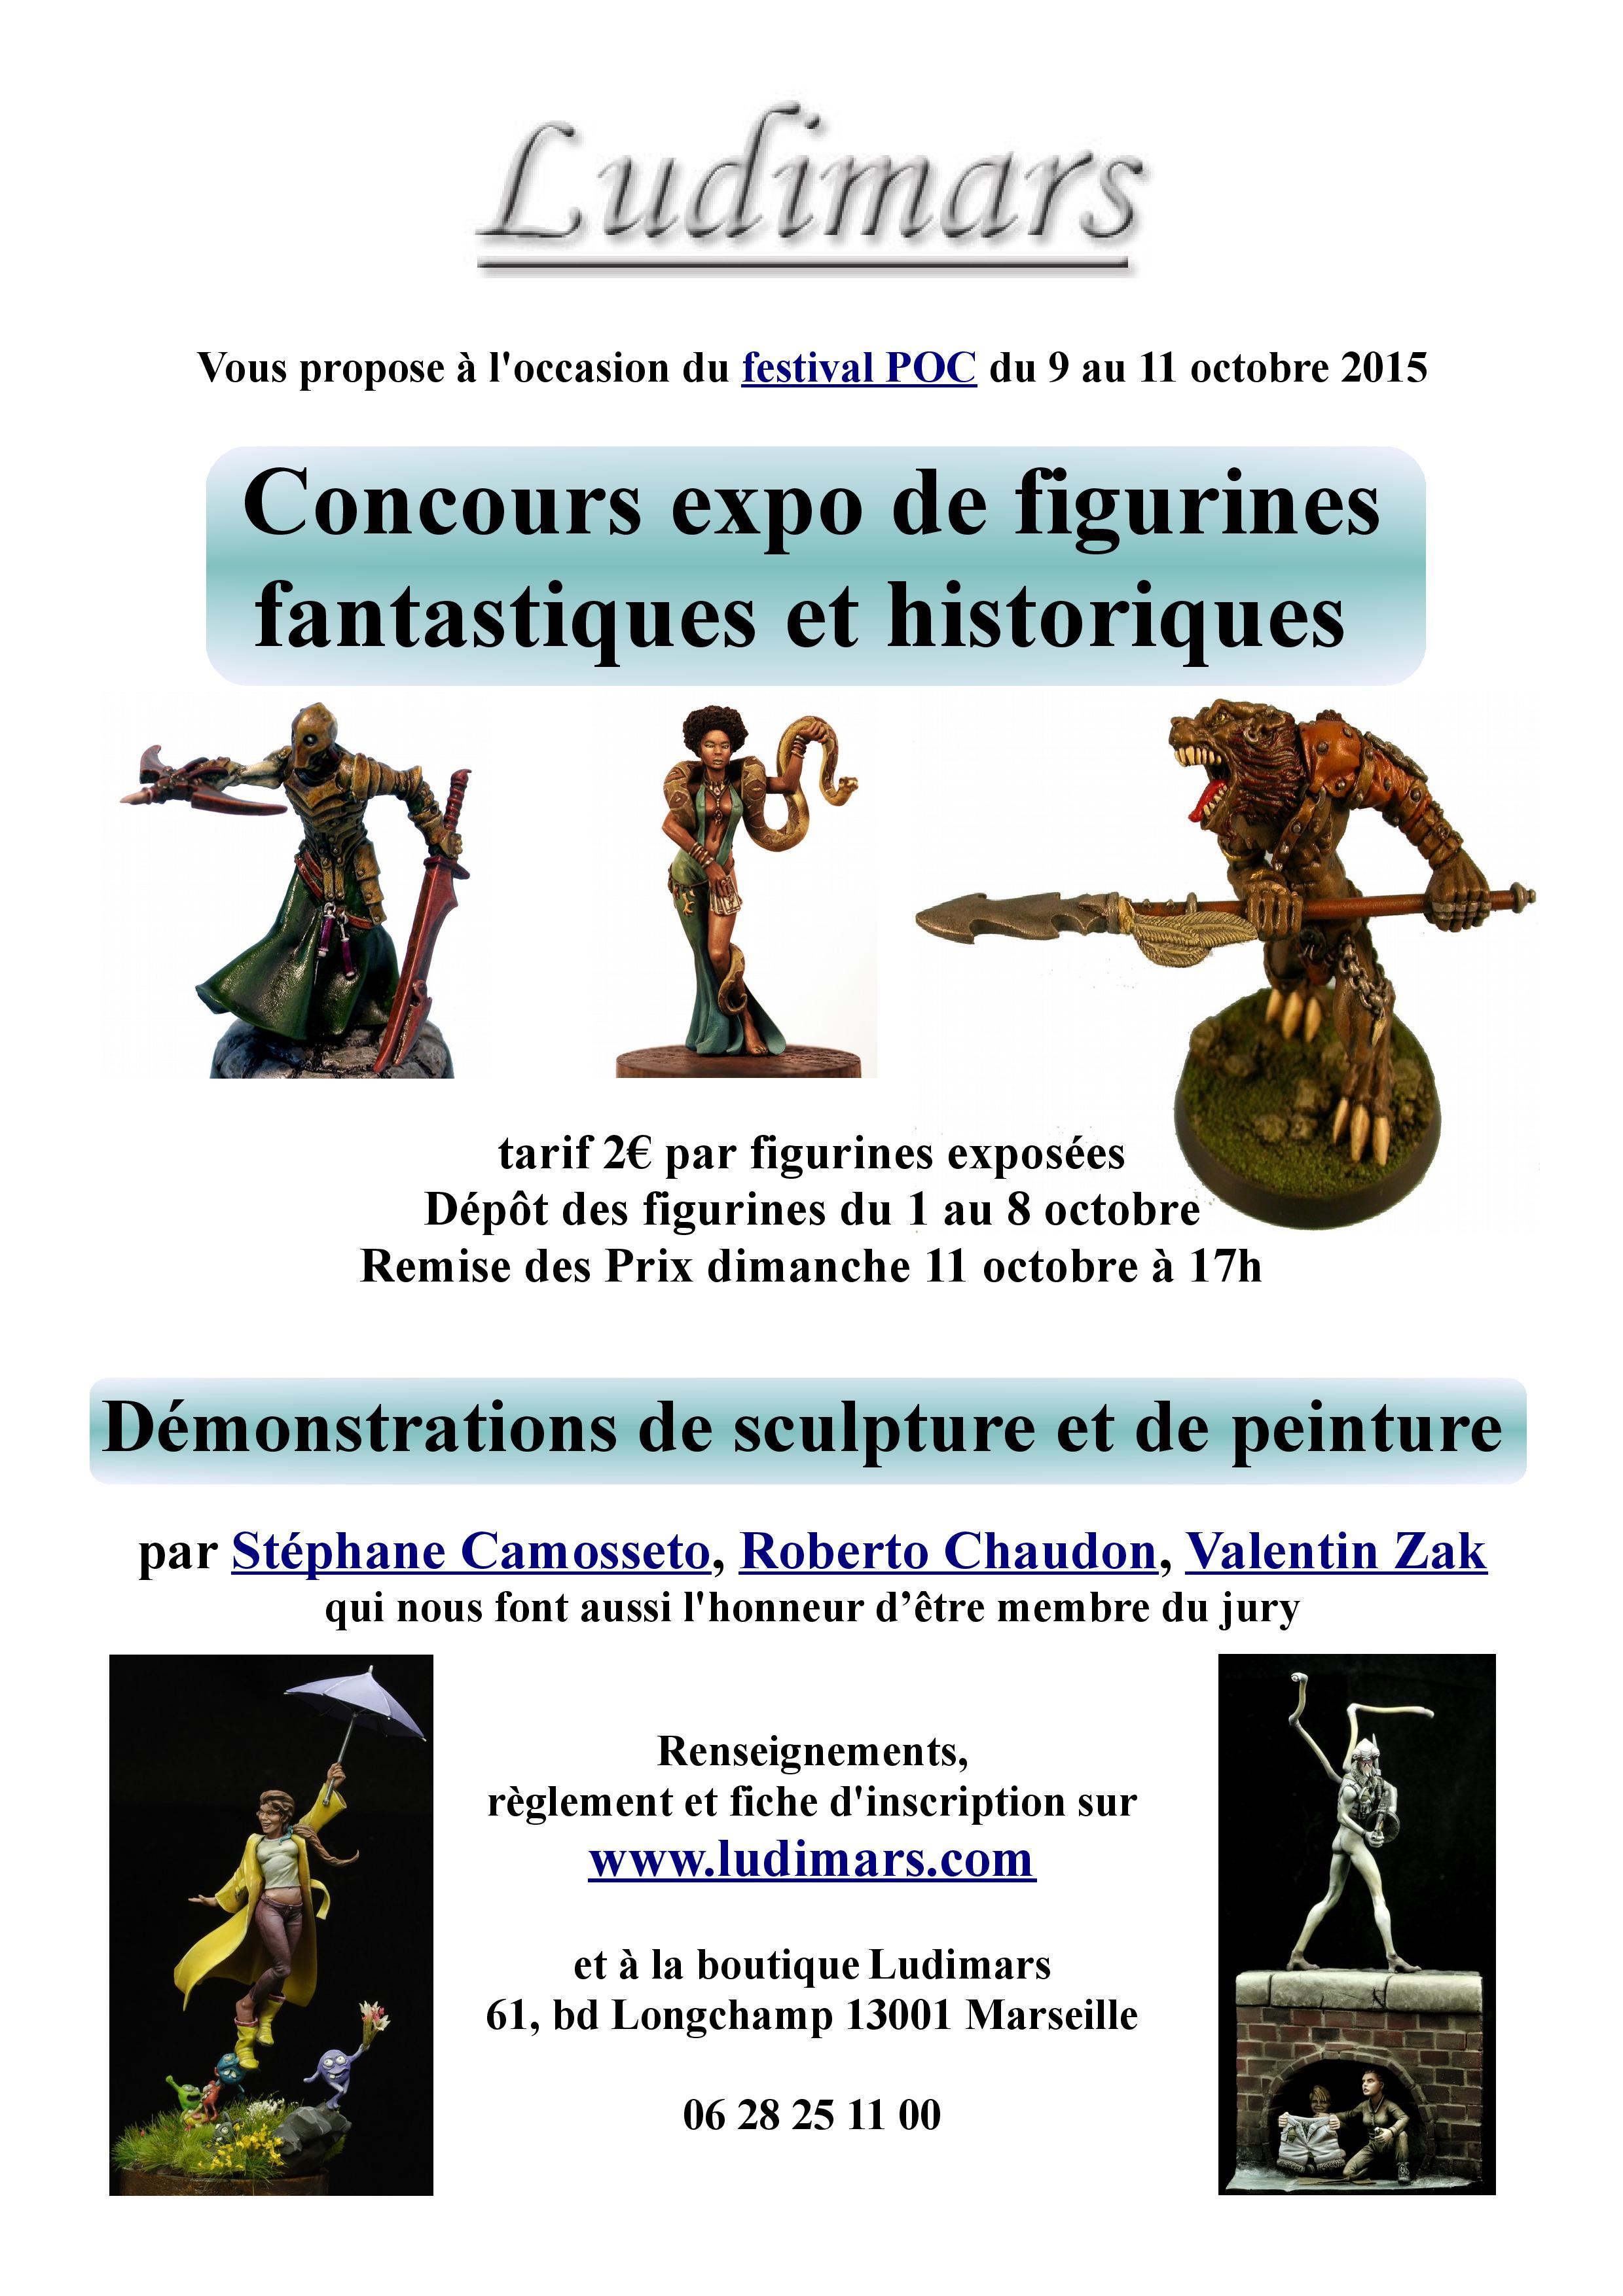 http://www.ludimars.com/concours/afficheConcoursLudimars2015.pdf